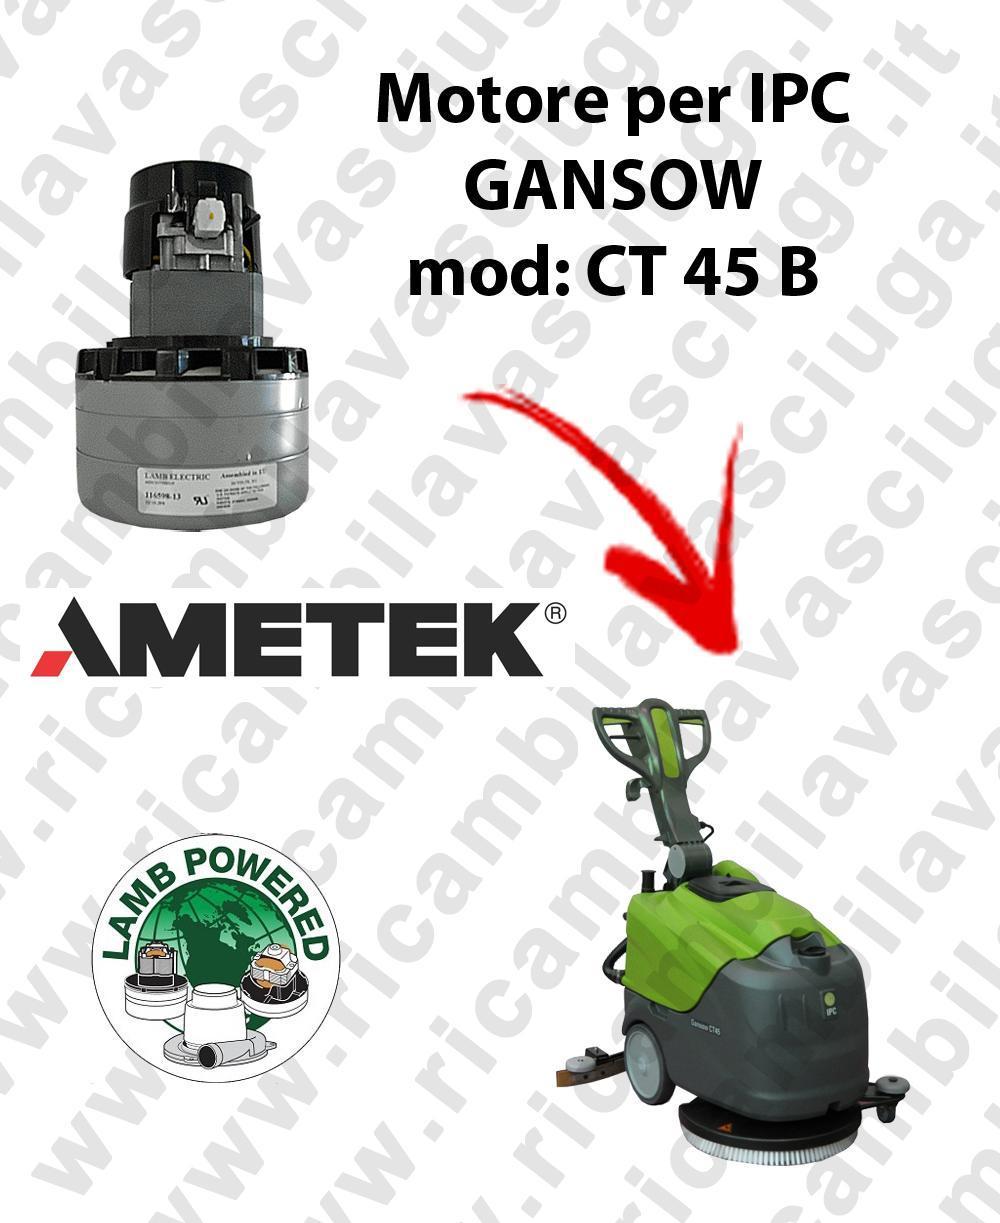 CT 45 B Motore de aspiración LAMB AMETEK para fregadora IPC GANSOW